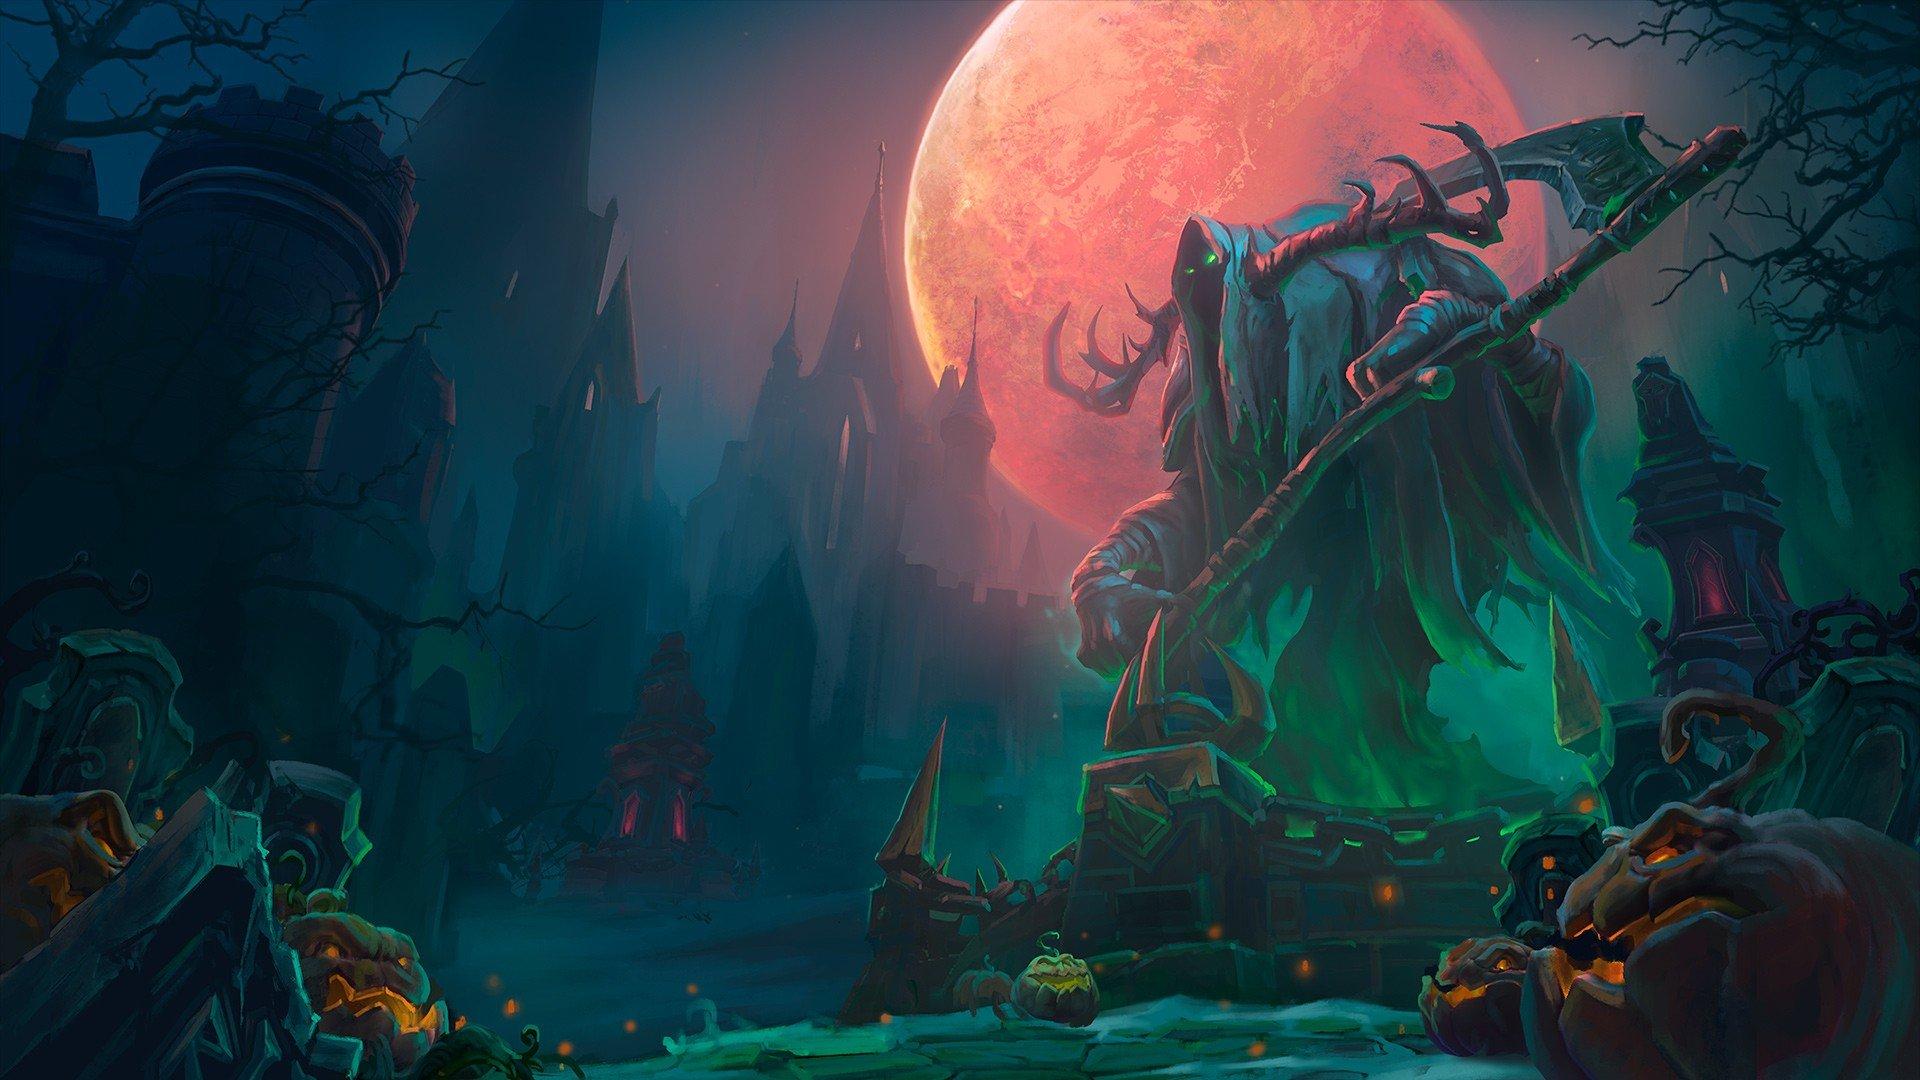 Heroes Of The Storm Towers Of Doom Halloween Dark Video Games